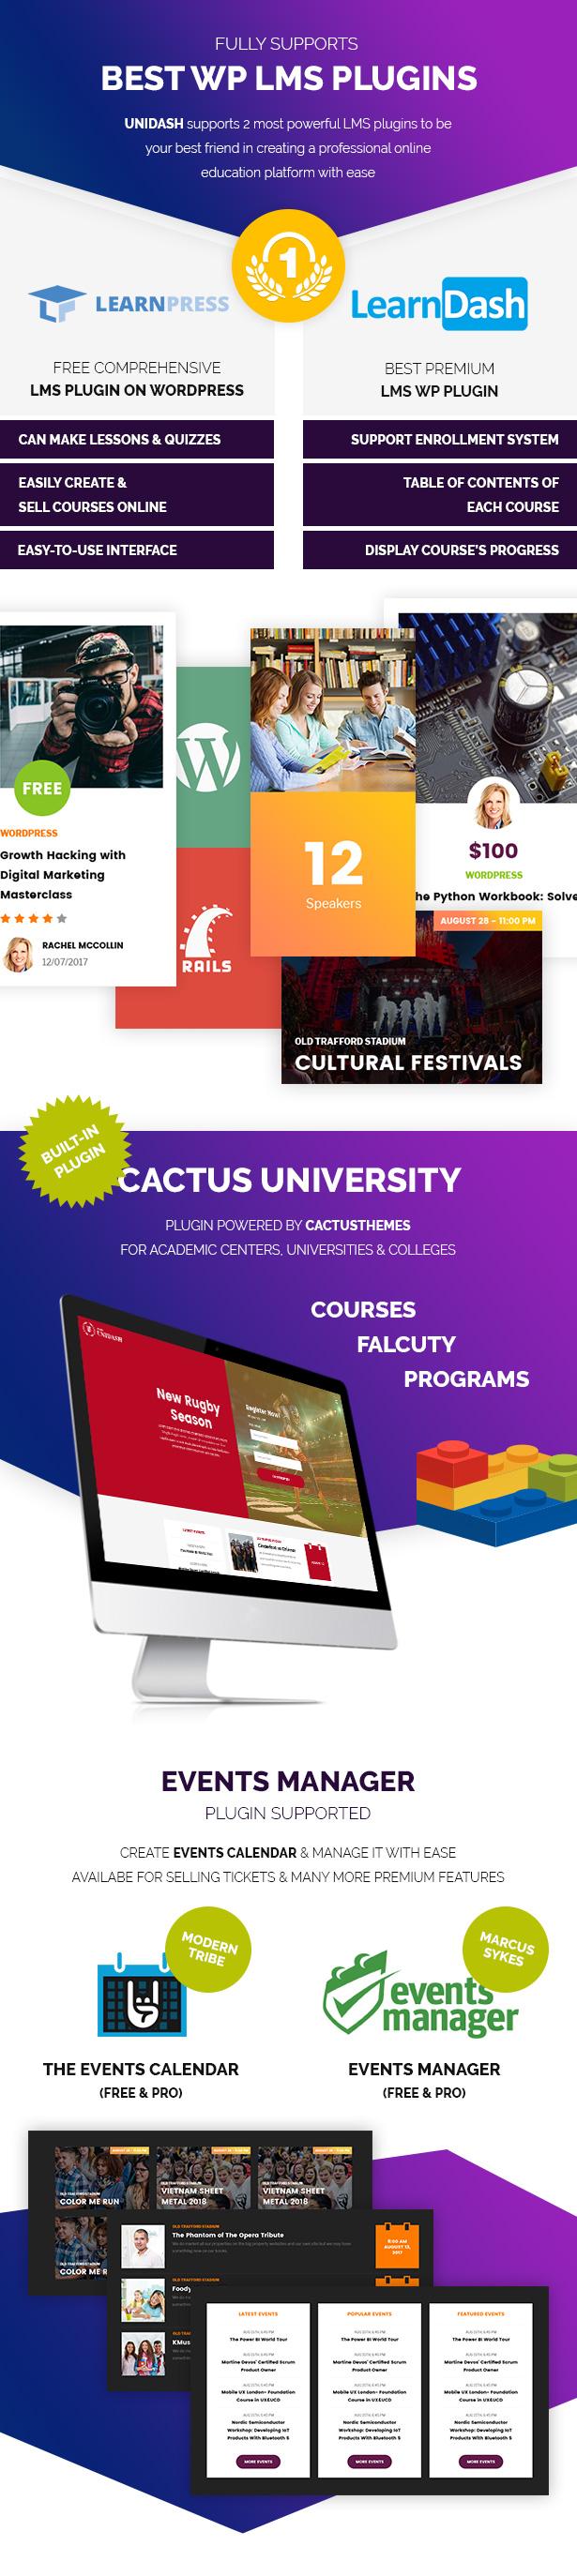 Unidash - WordPress Theme for University and Online Education - 12